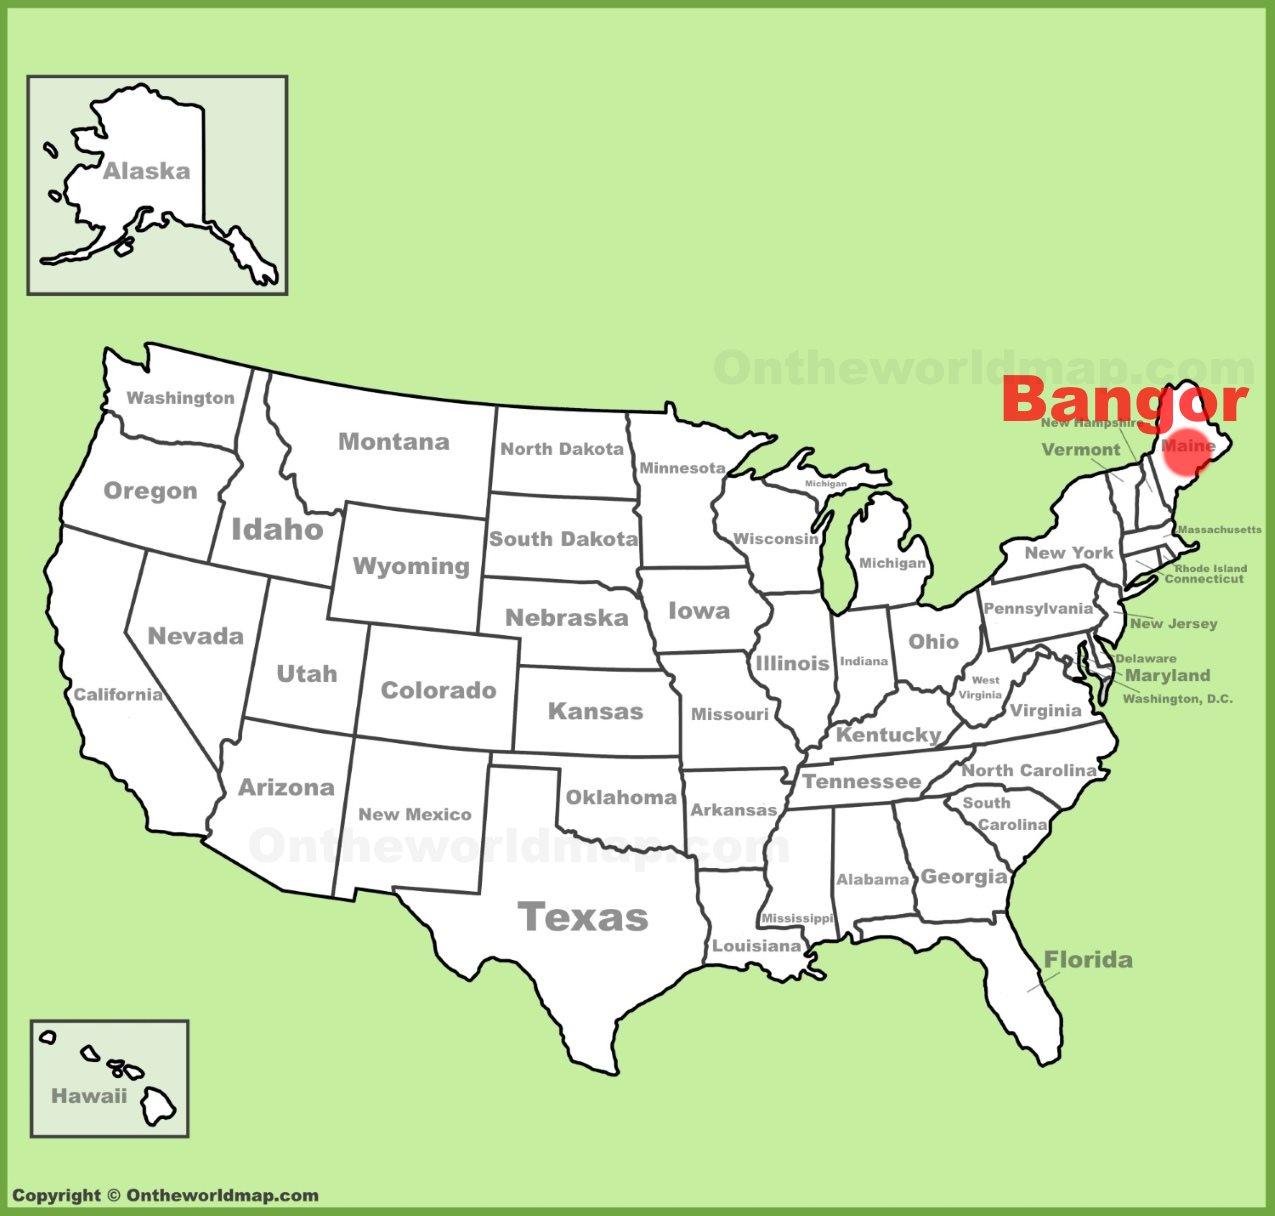 Map Of Bangor Bangor location on the U.S. Map